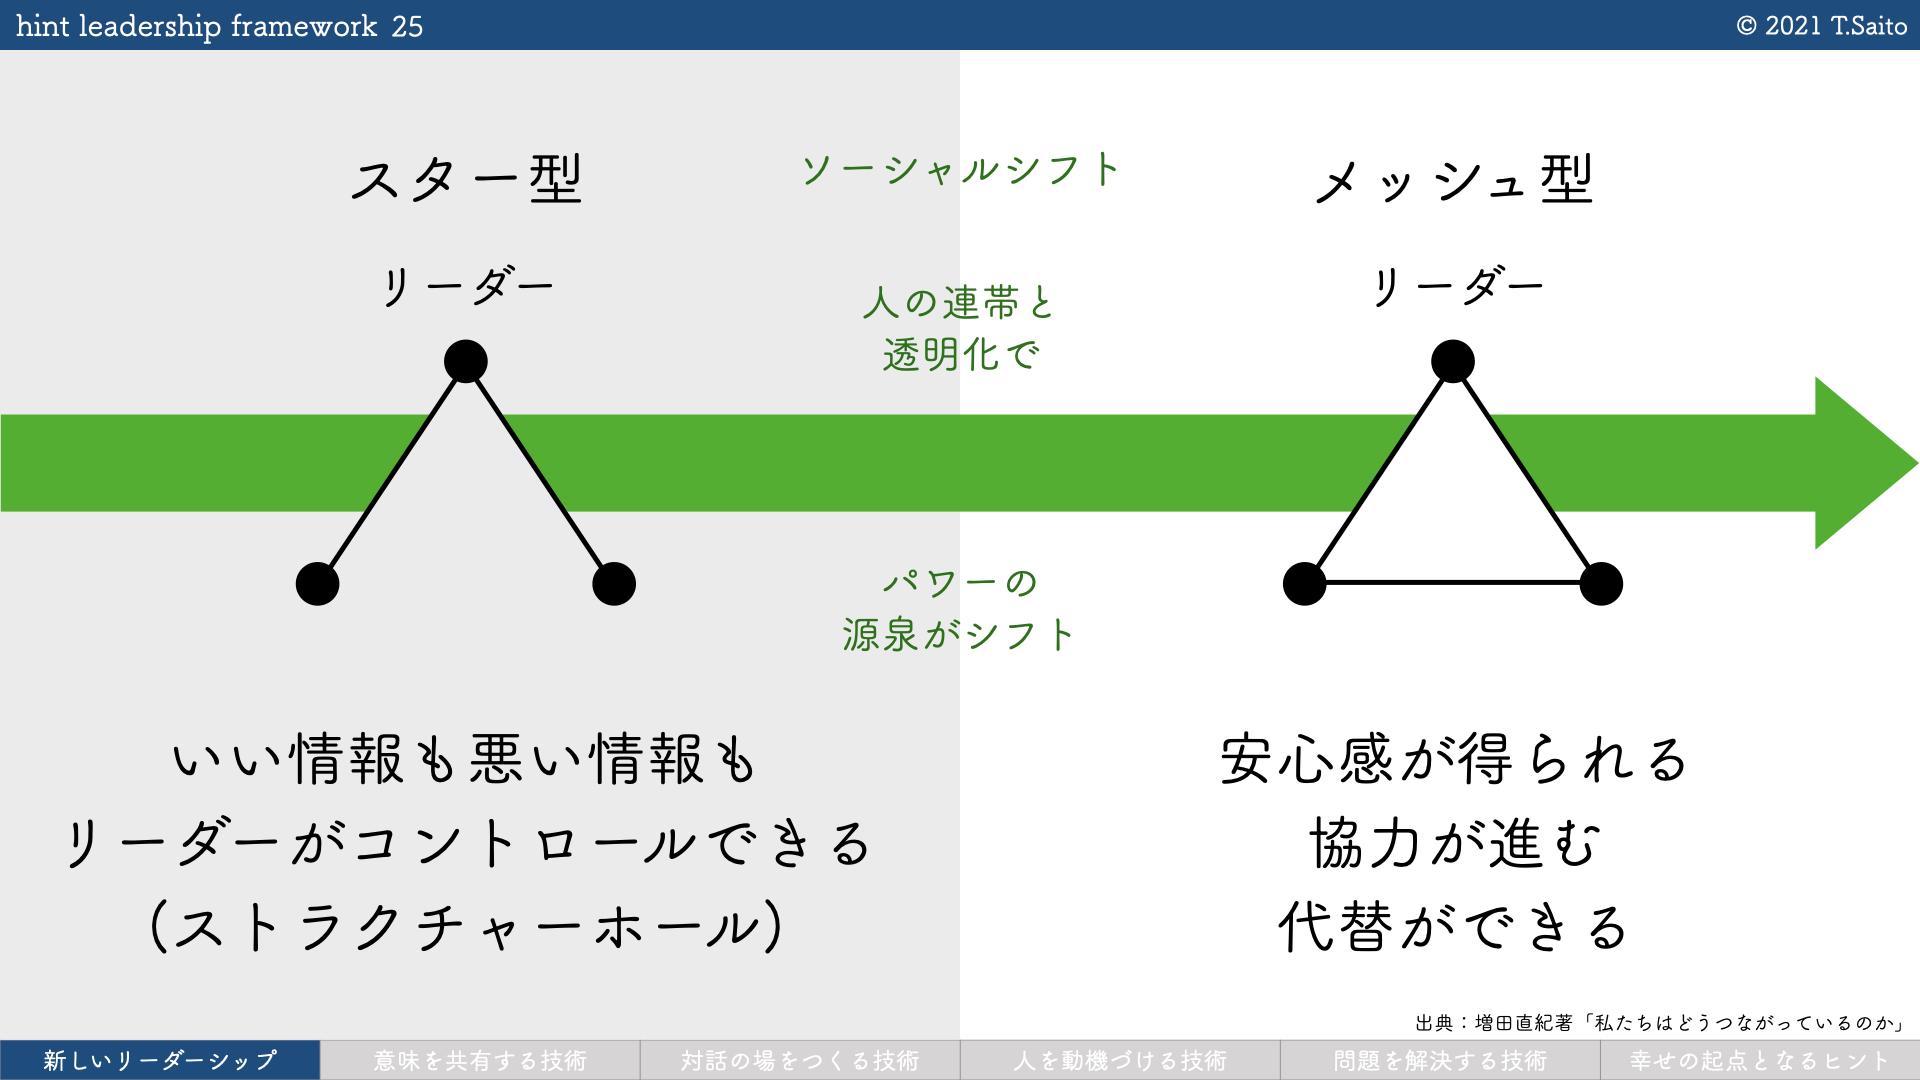 hint leadership framework 1.0.1.025